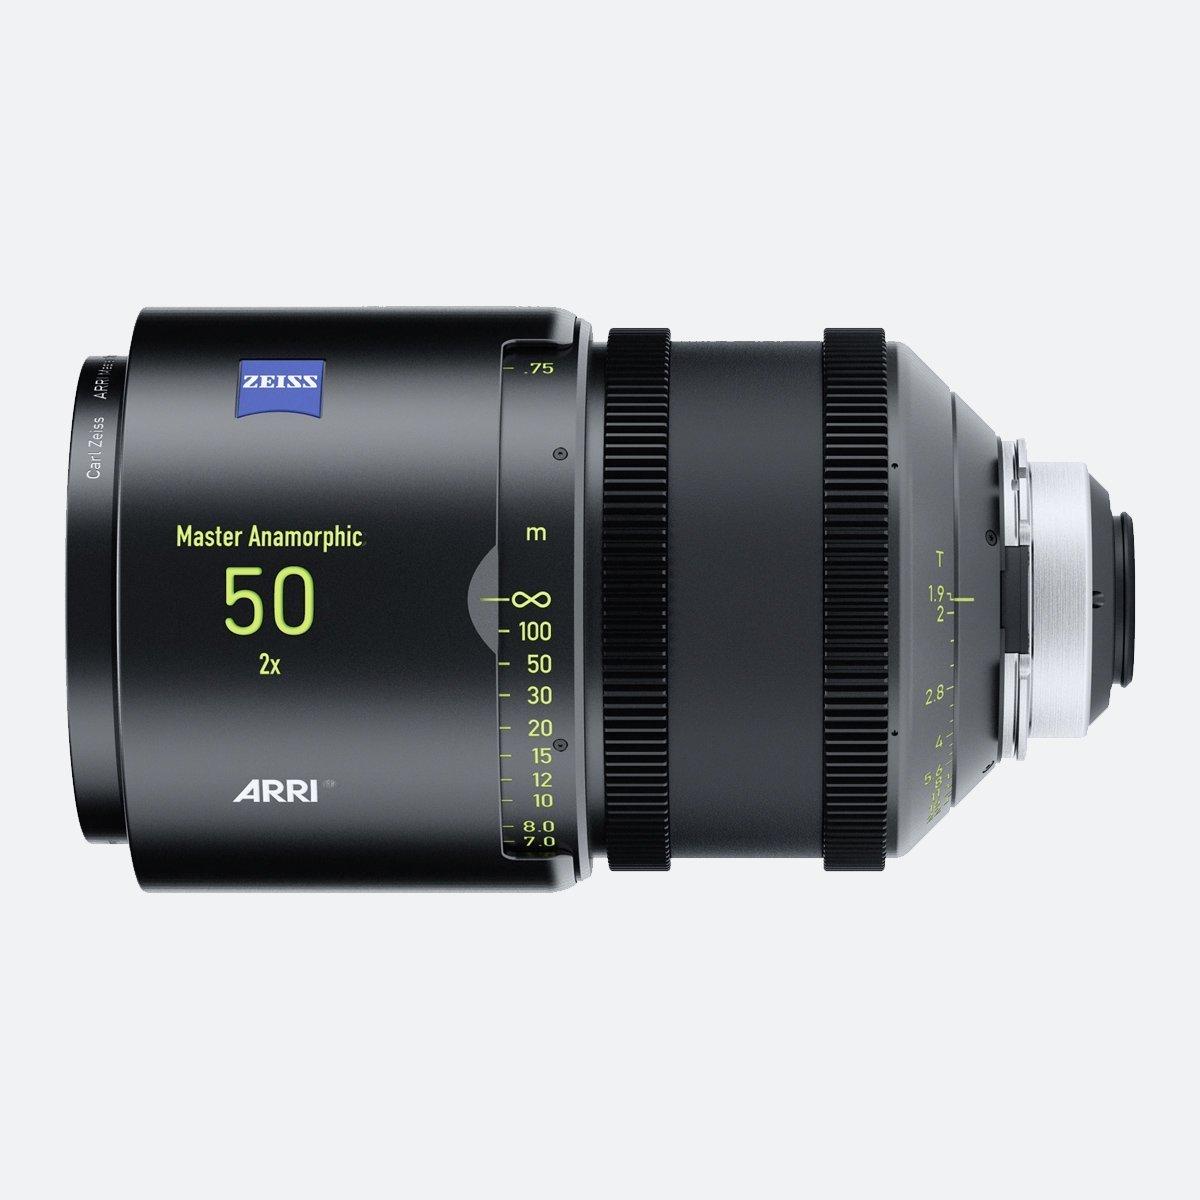 ARRI 50mm T1.9 Master Anamorphic Lens